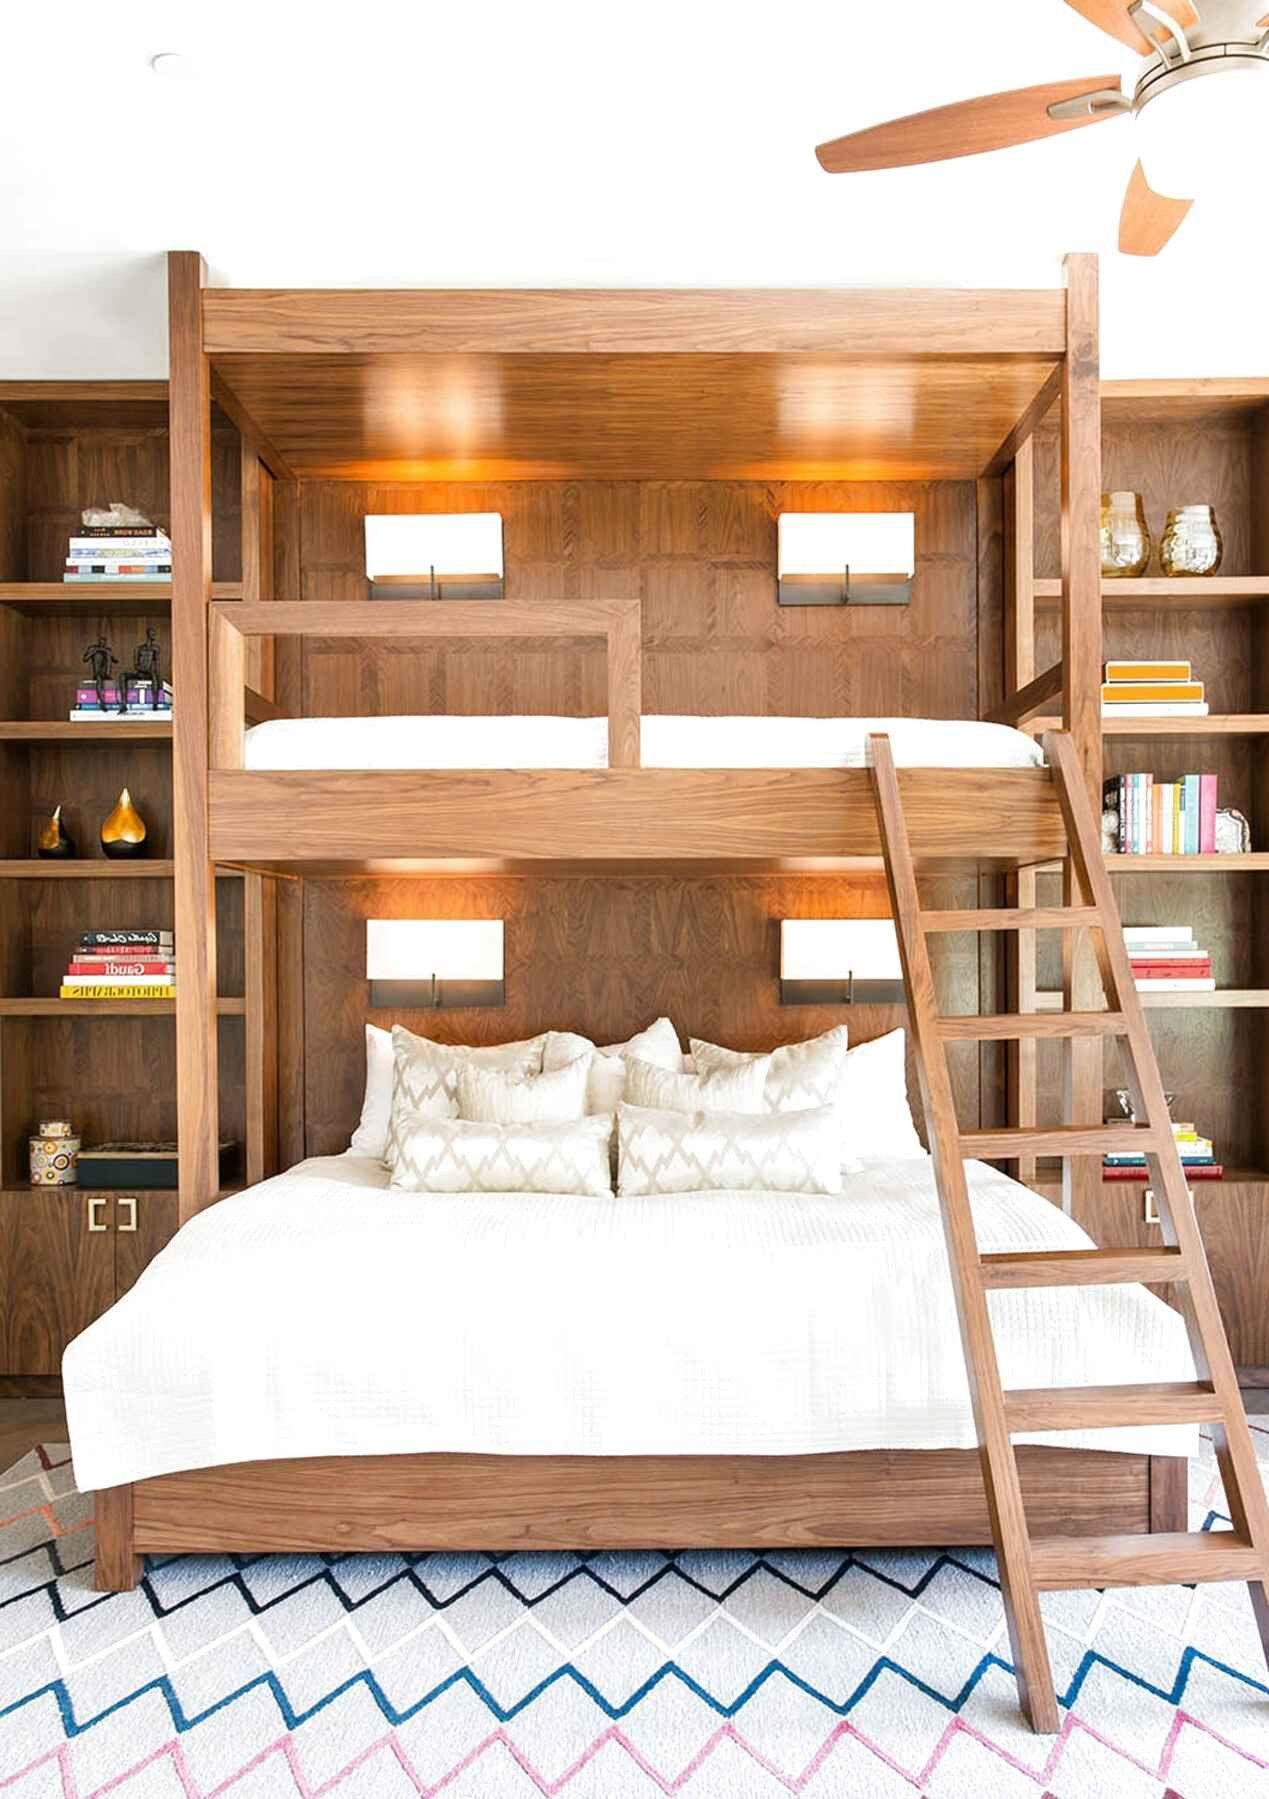 Bunk Beds Sale 2021 in 2020 Bunk beds for sale, Huge